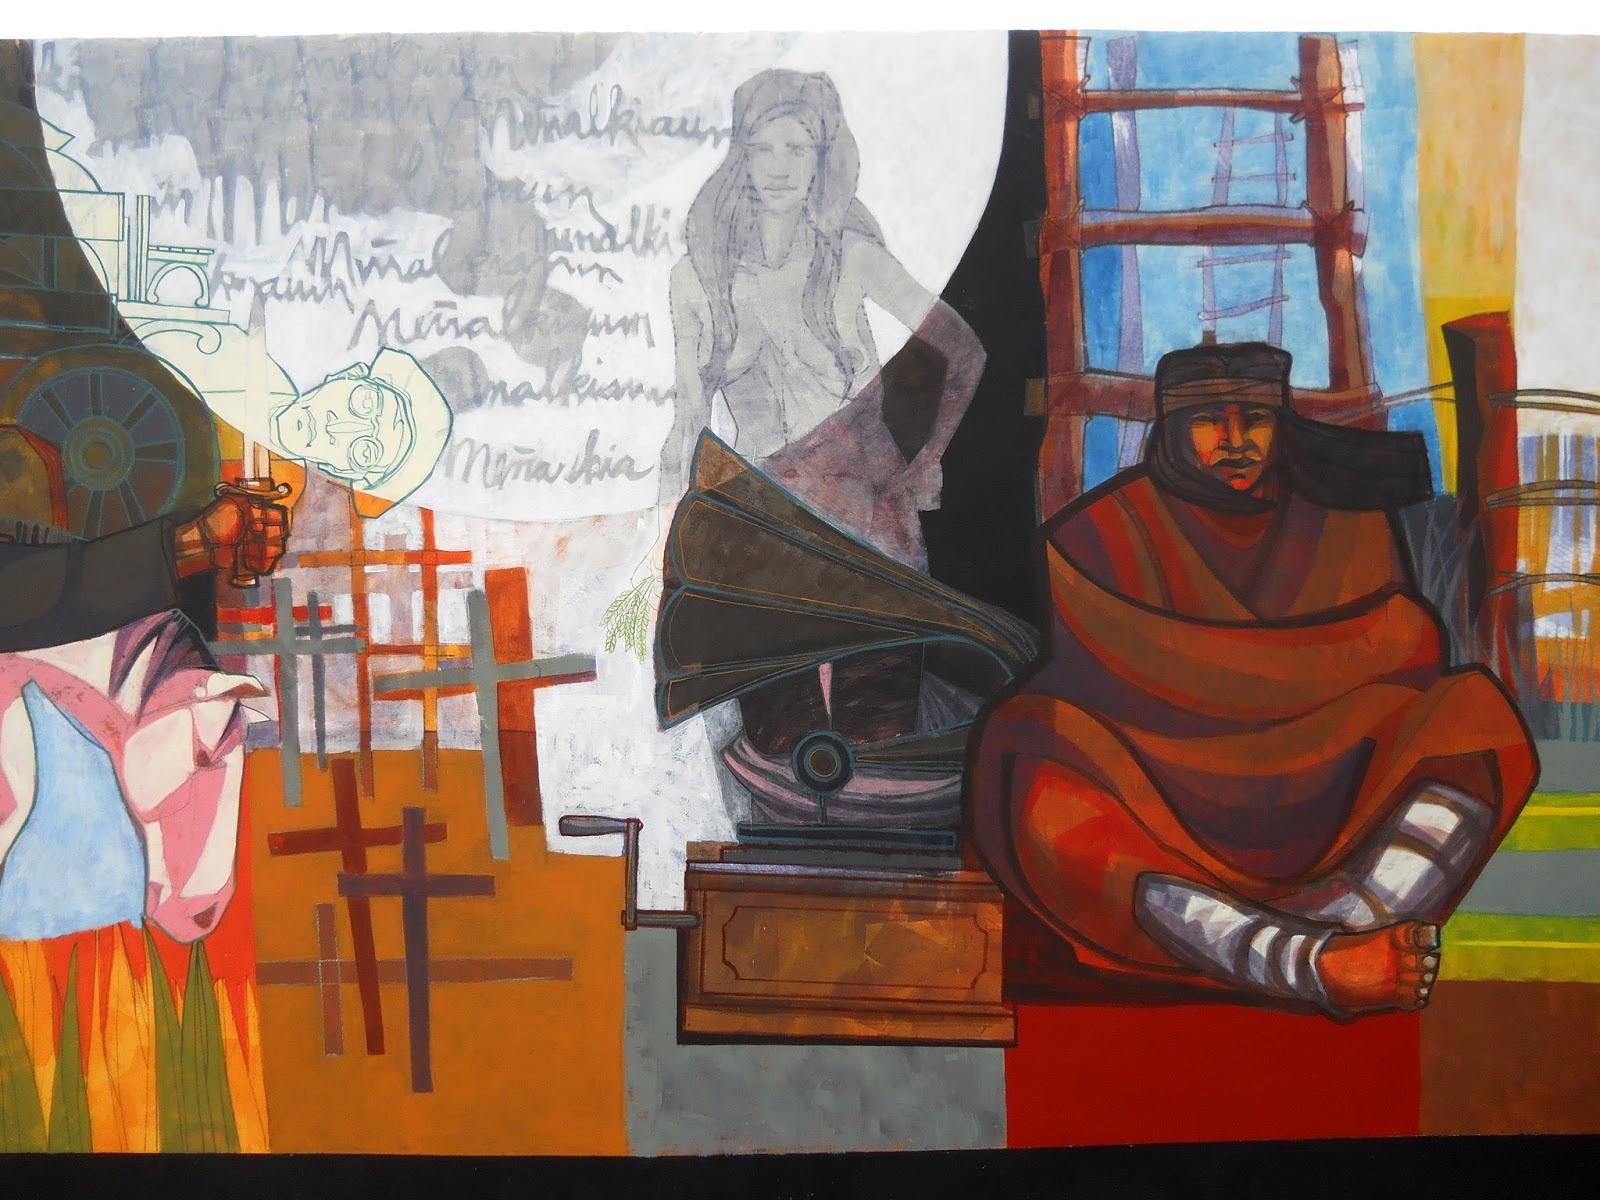 Carpita muralismo y arte p blico obra mural for Mural la misma luna